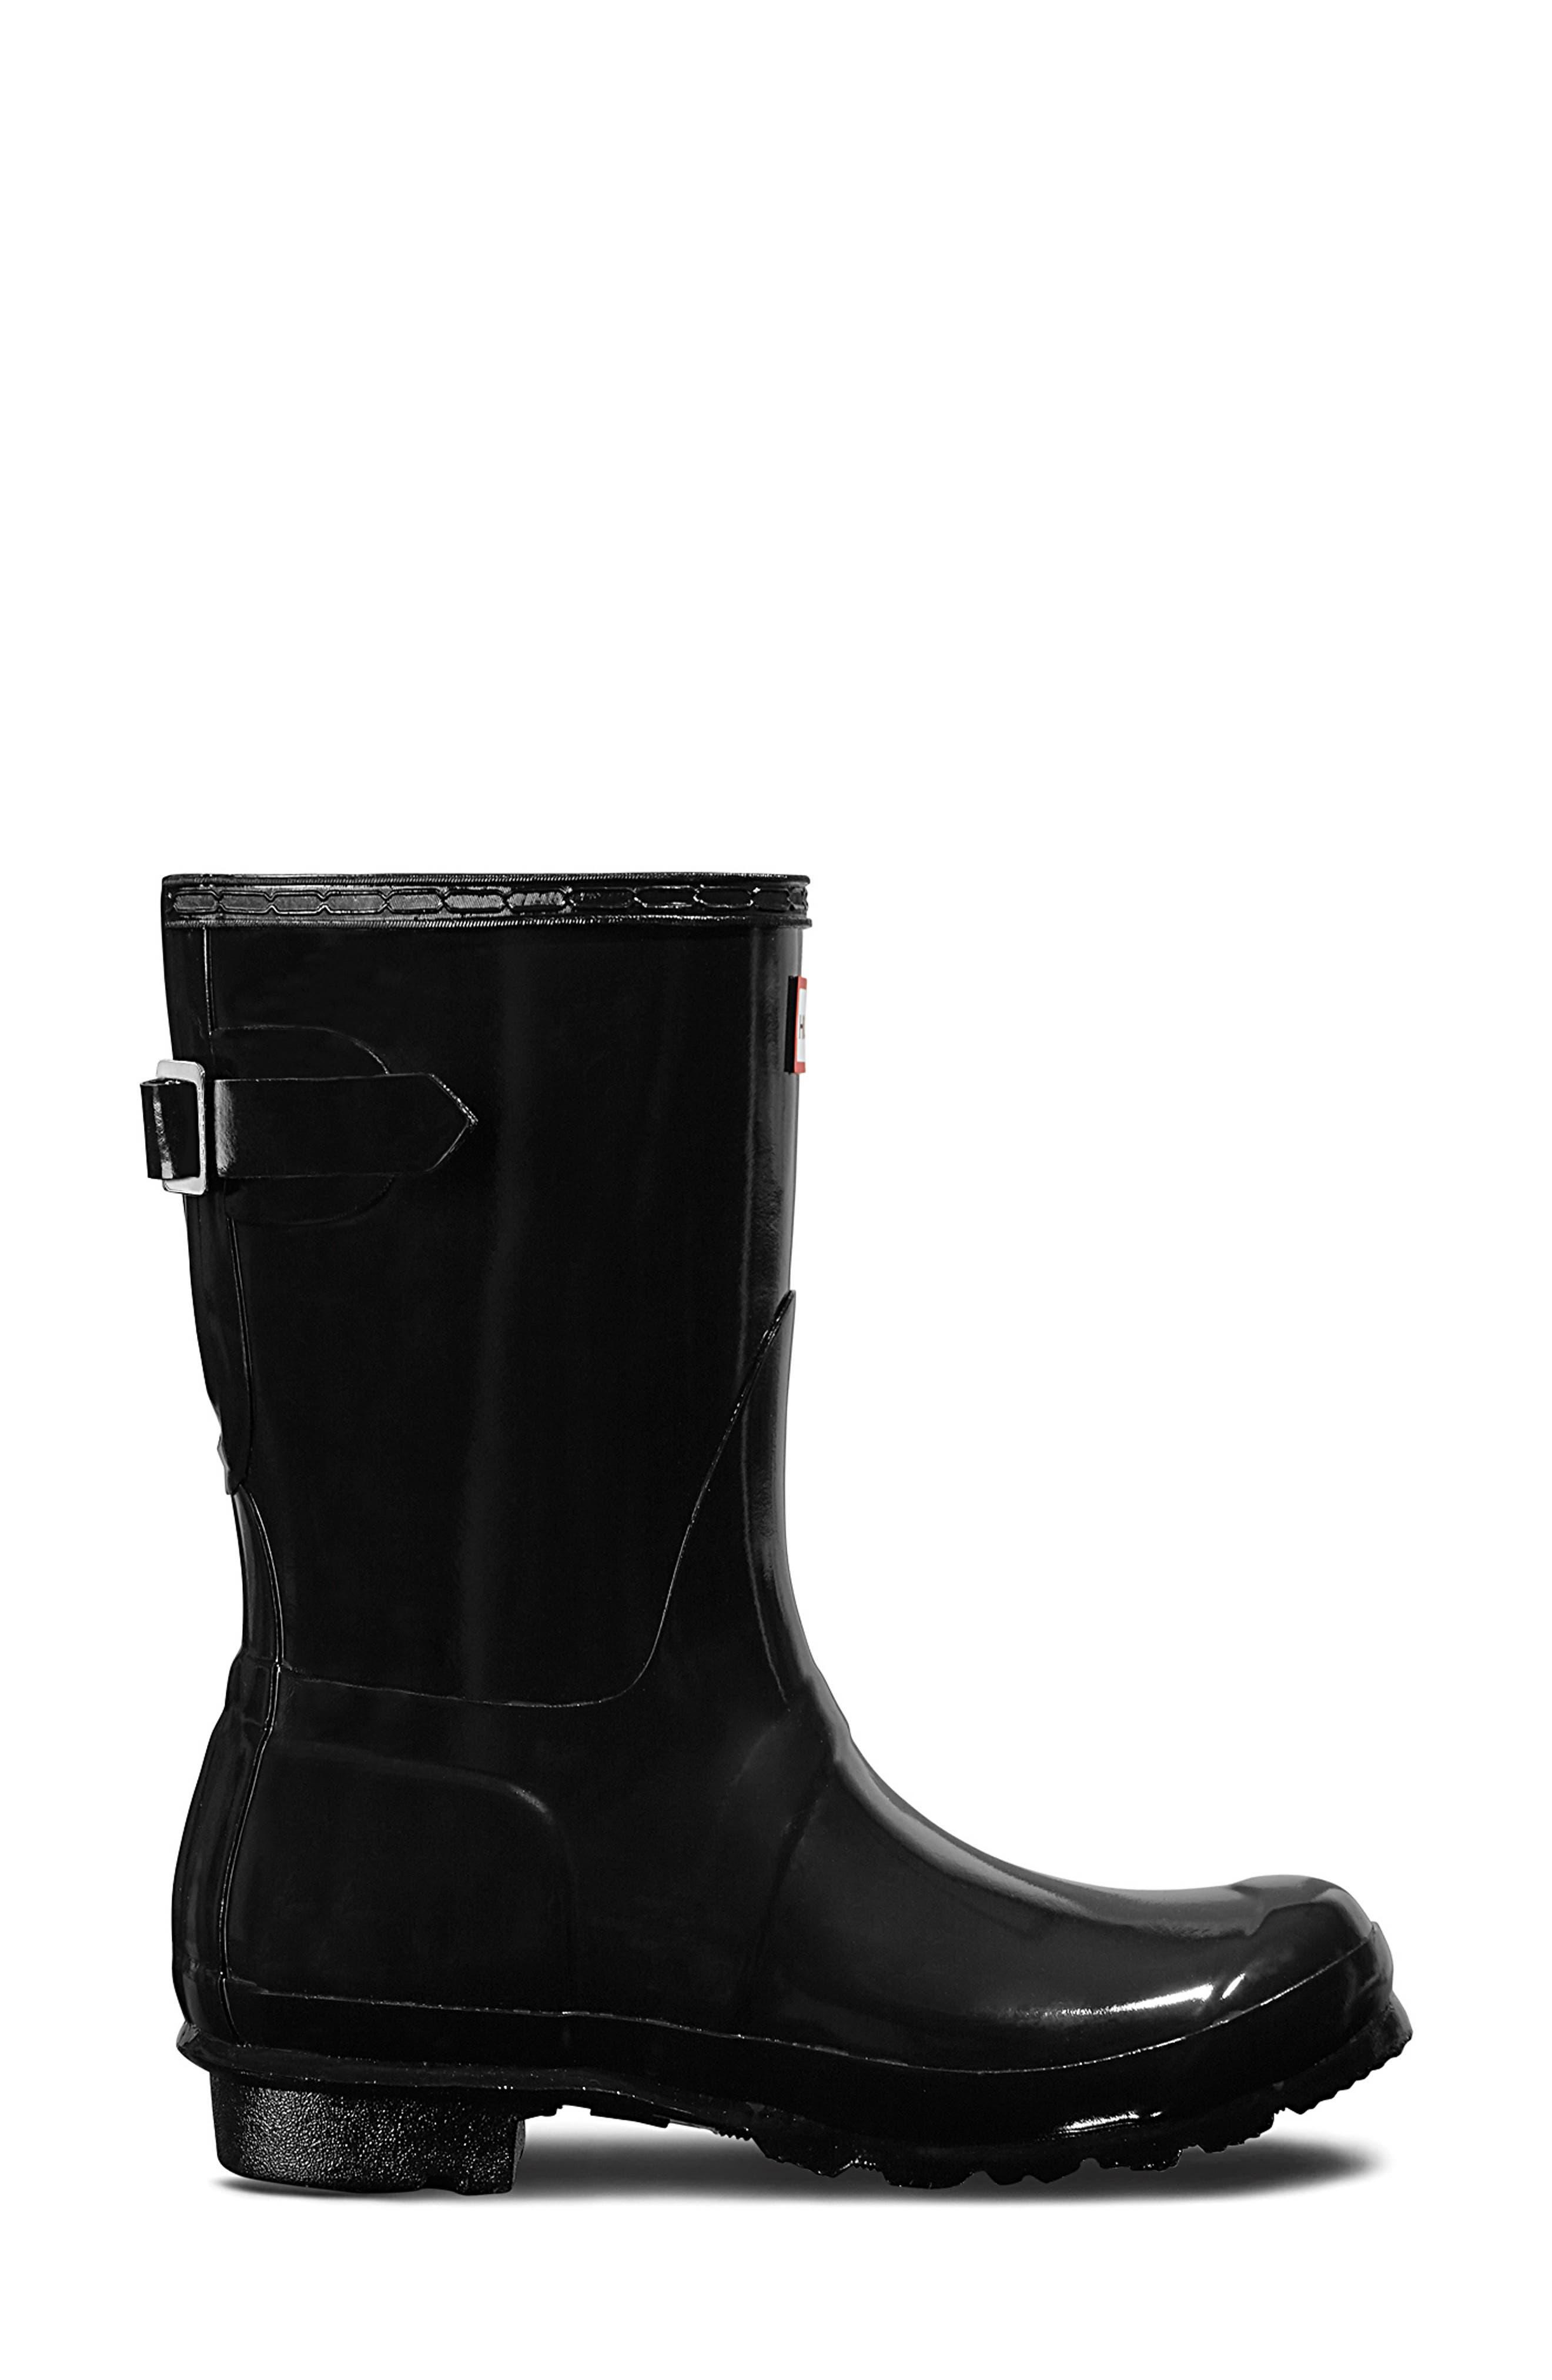 HUNTER, Original Short Adjustable Back Gloss Waterproof Rain Boot, Alternate thumbnail 3, color, BLACK